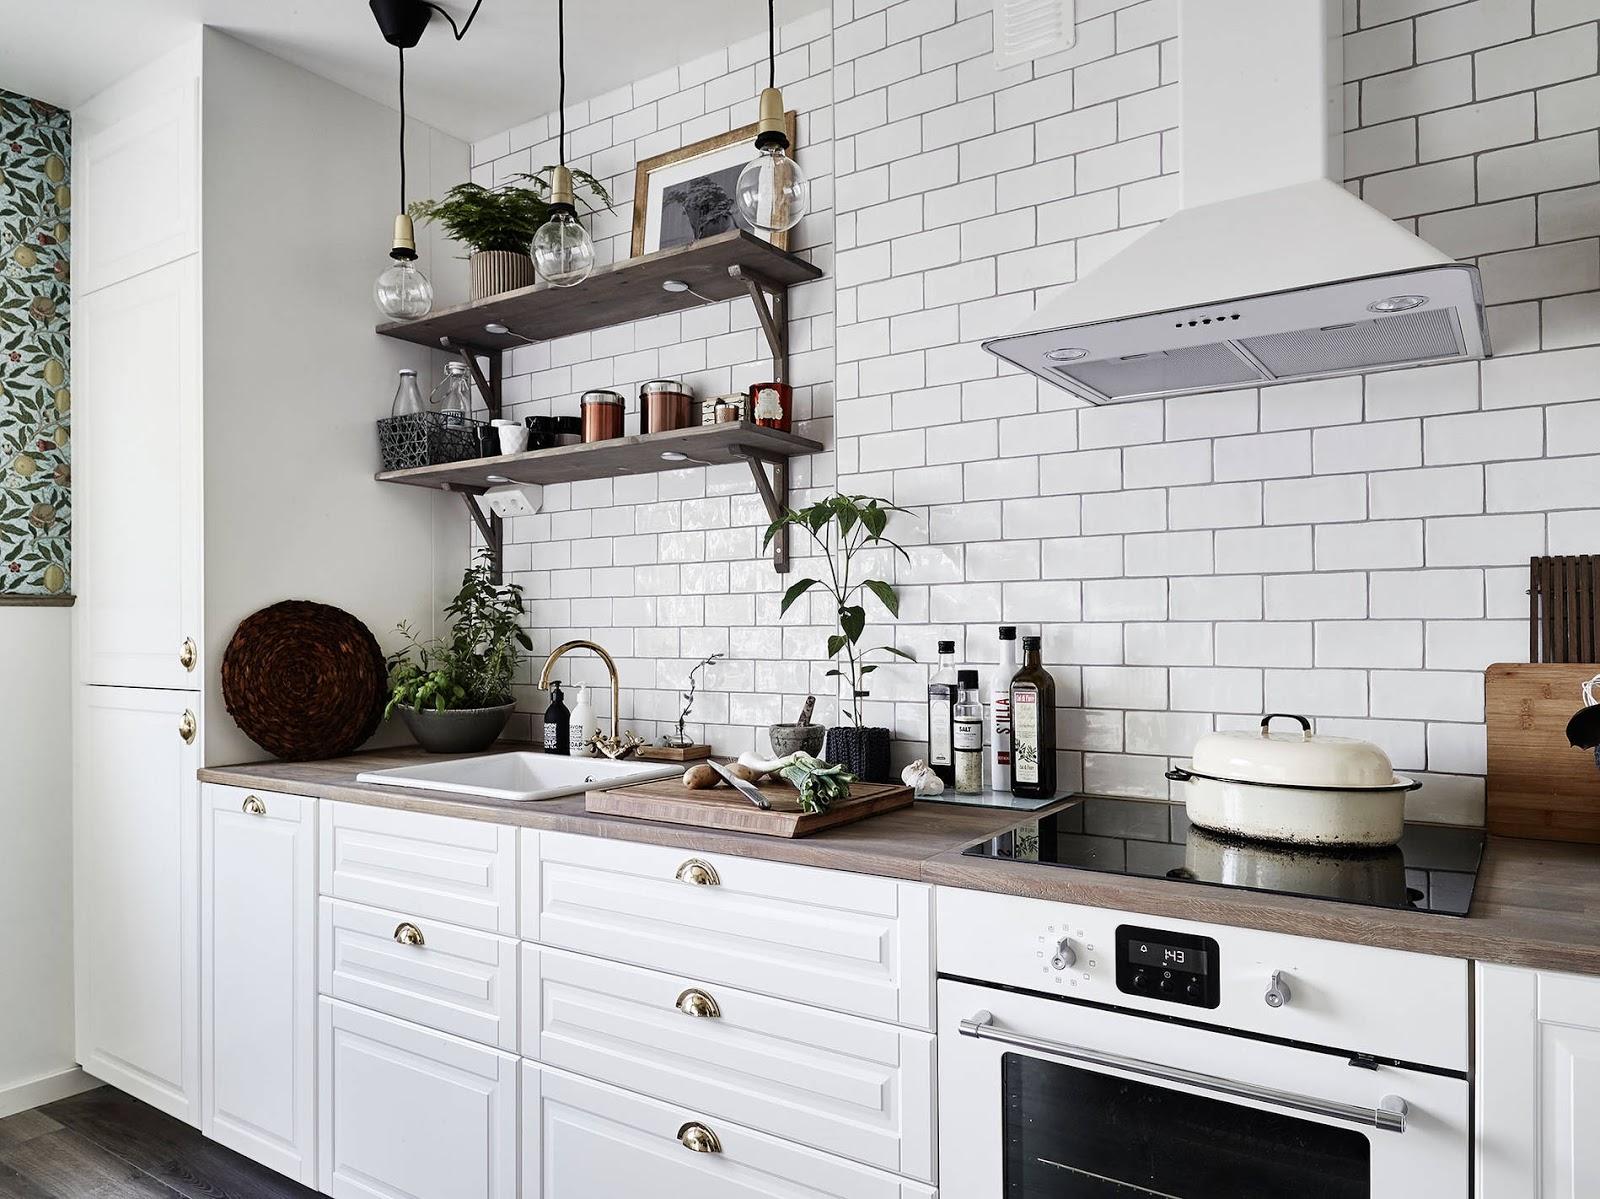 kafelki metro, białe kafelki do kuchni, kafelki prostokąty